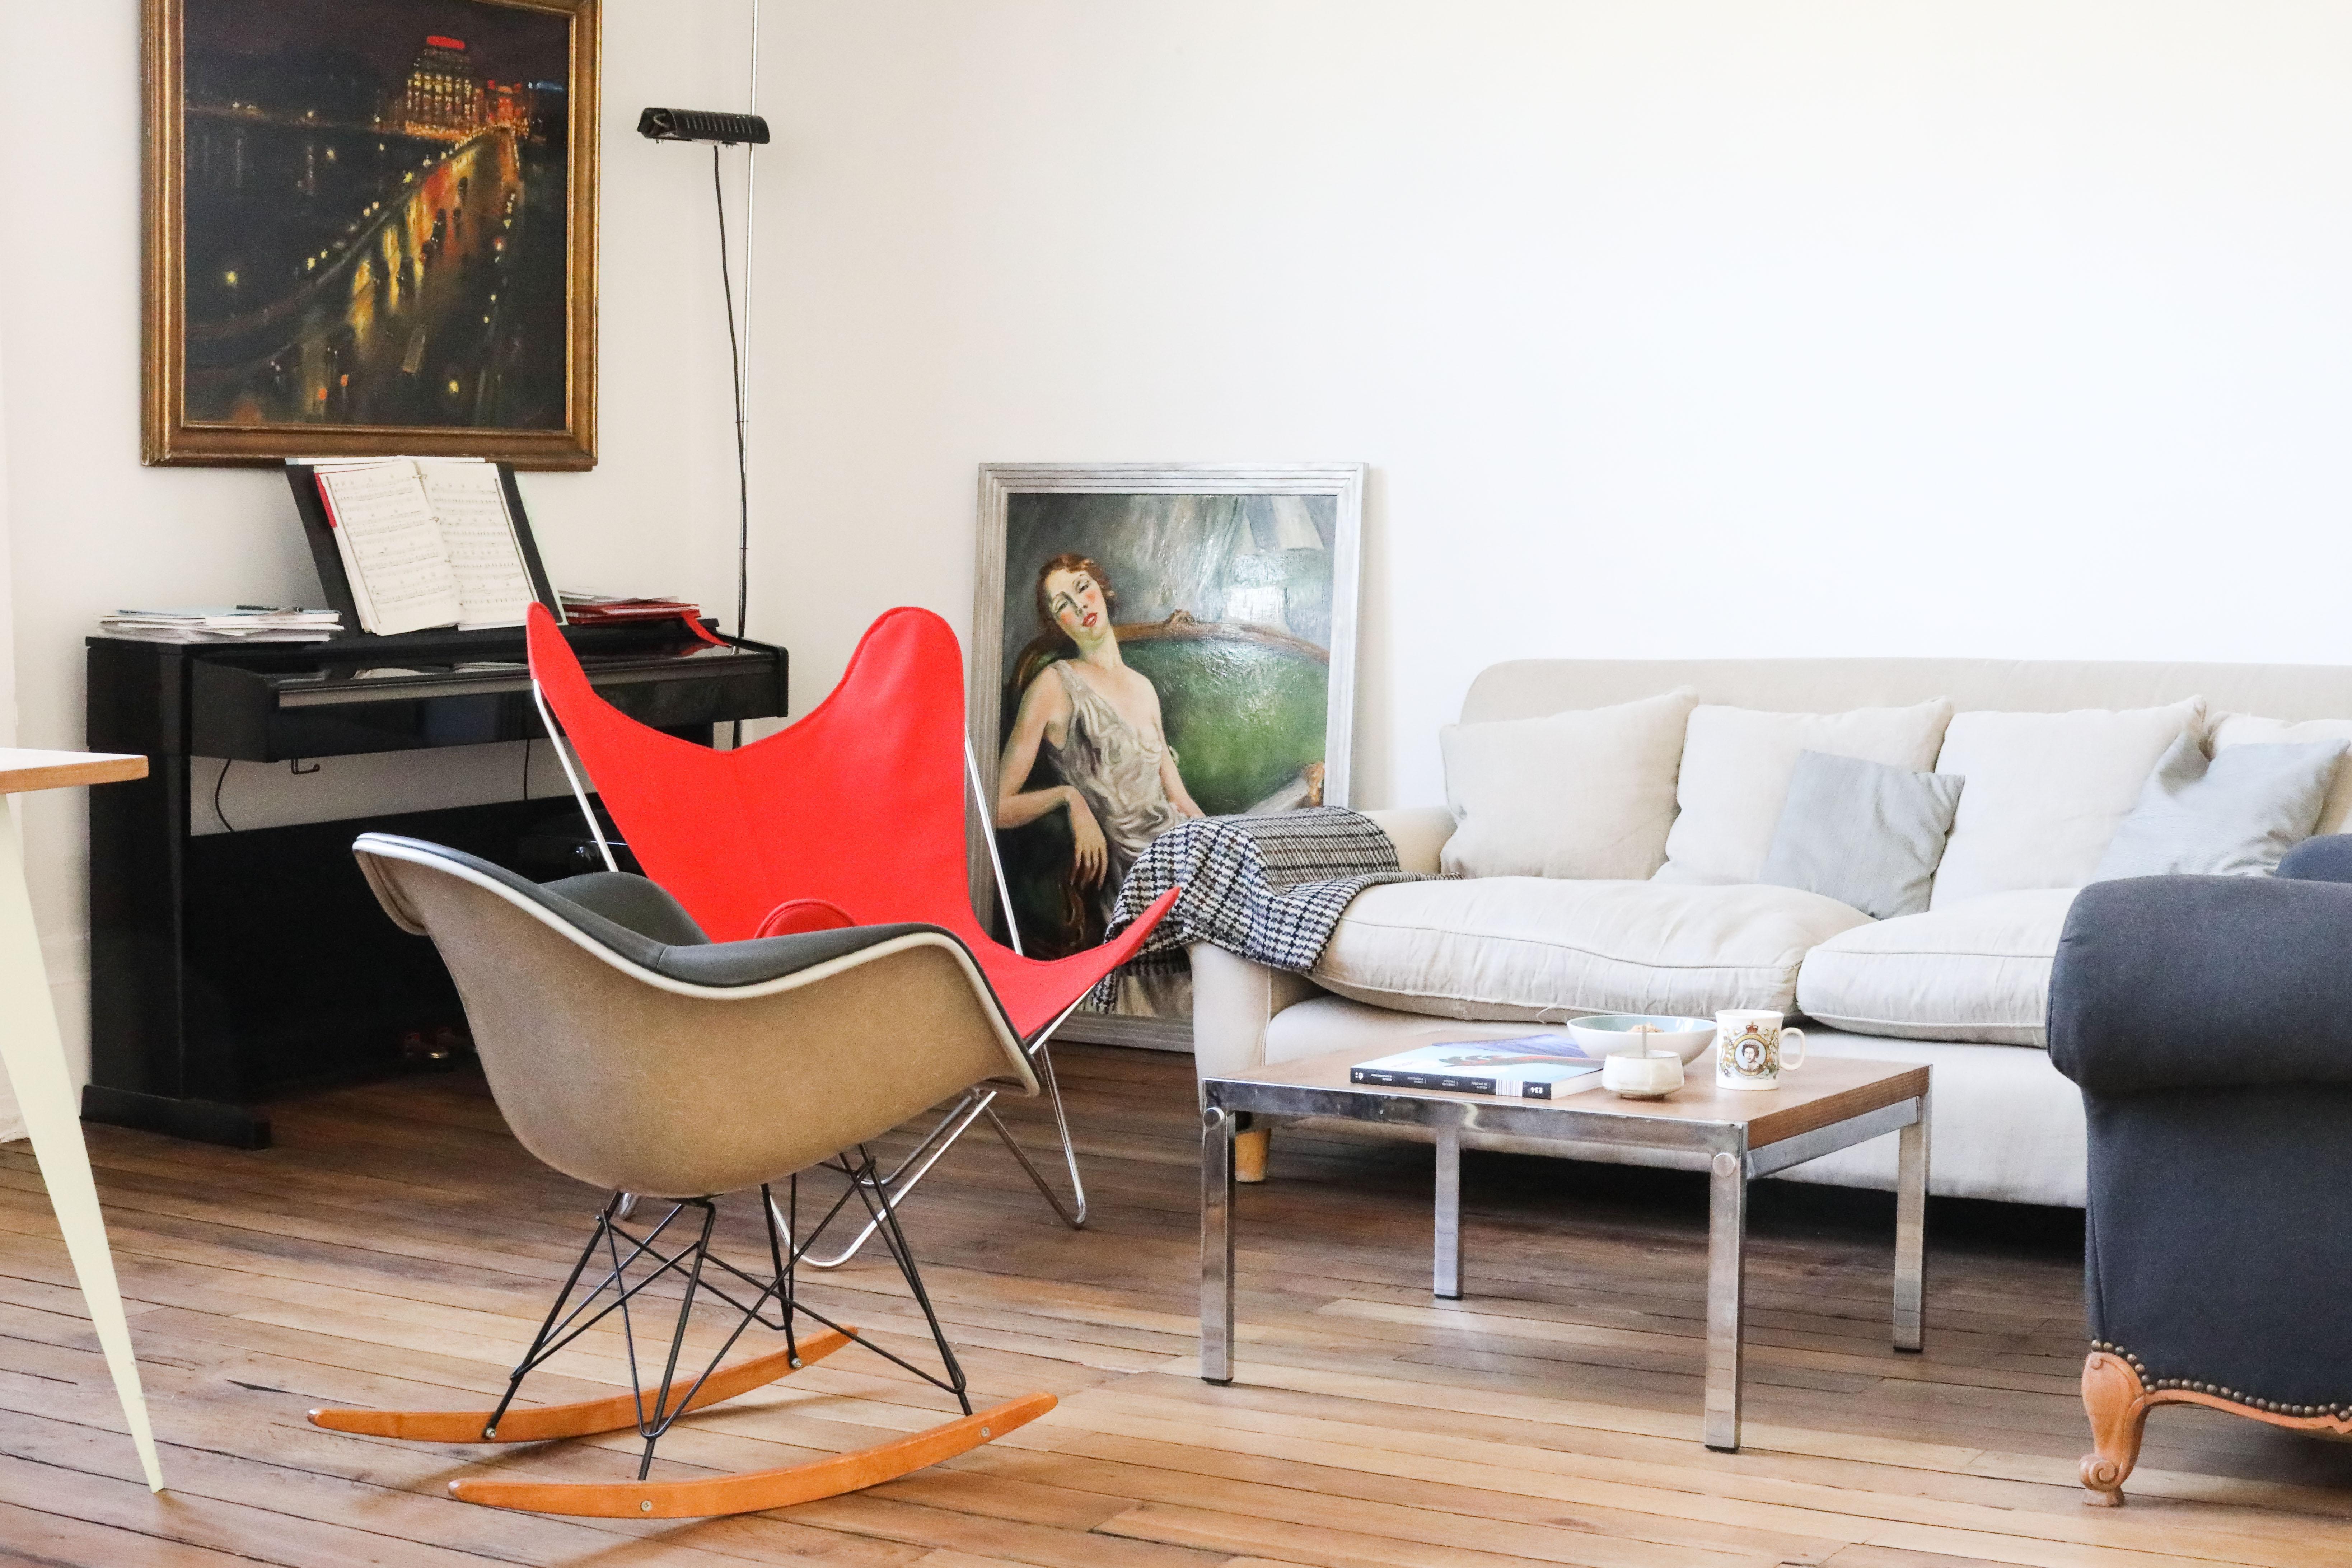 Salon – Alex Palenski et Flora Mitjavile